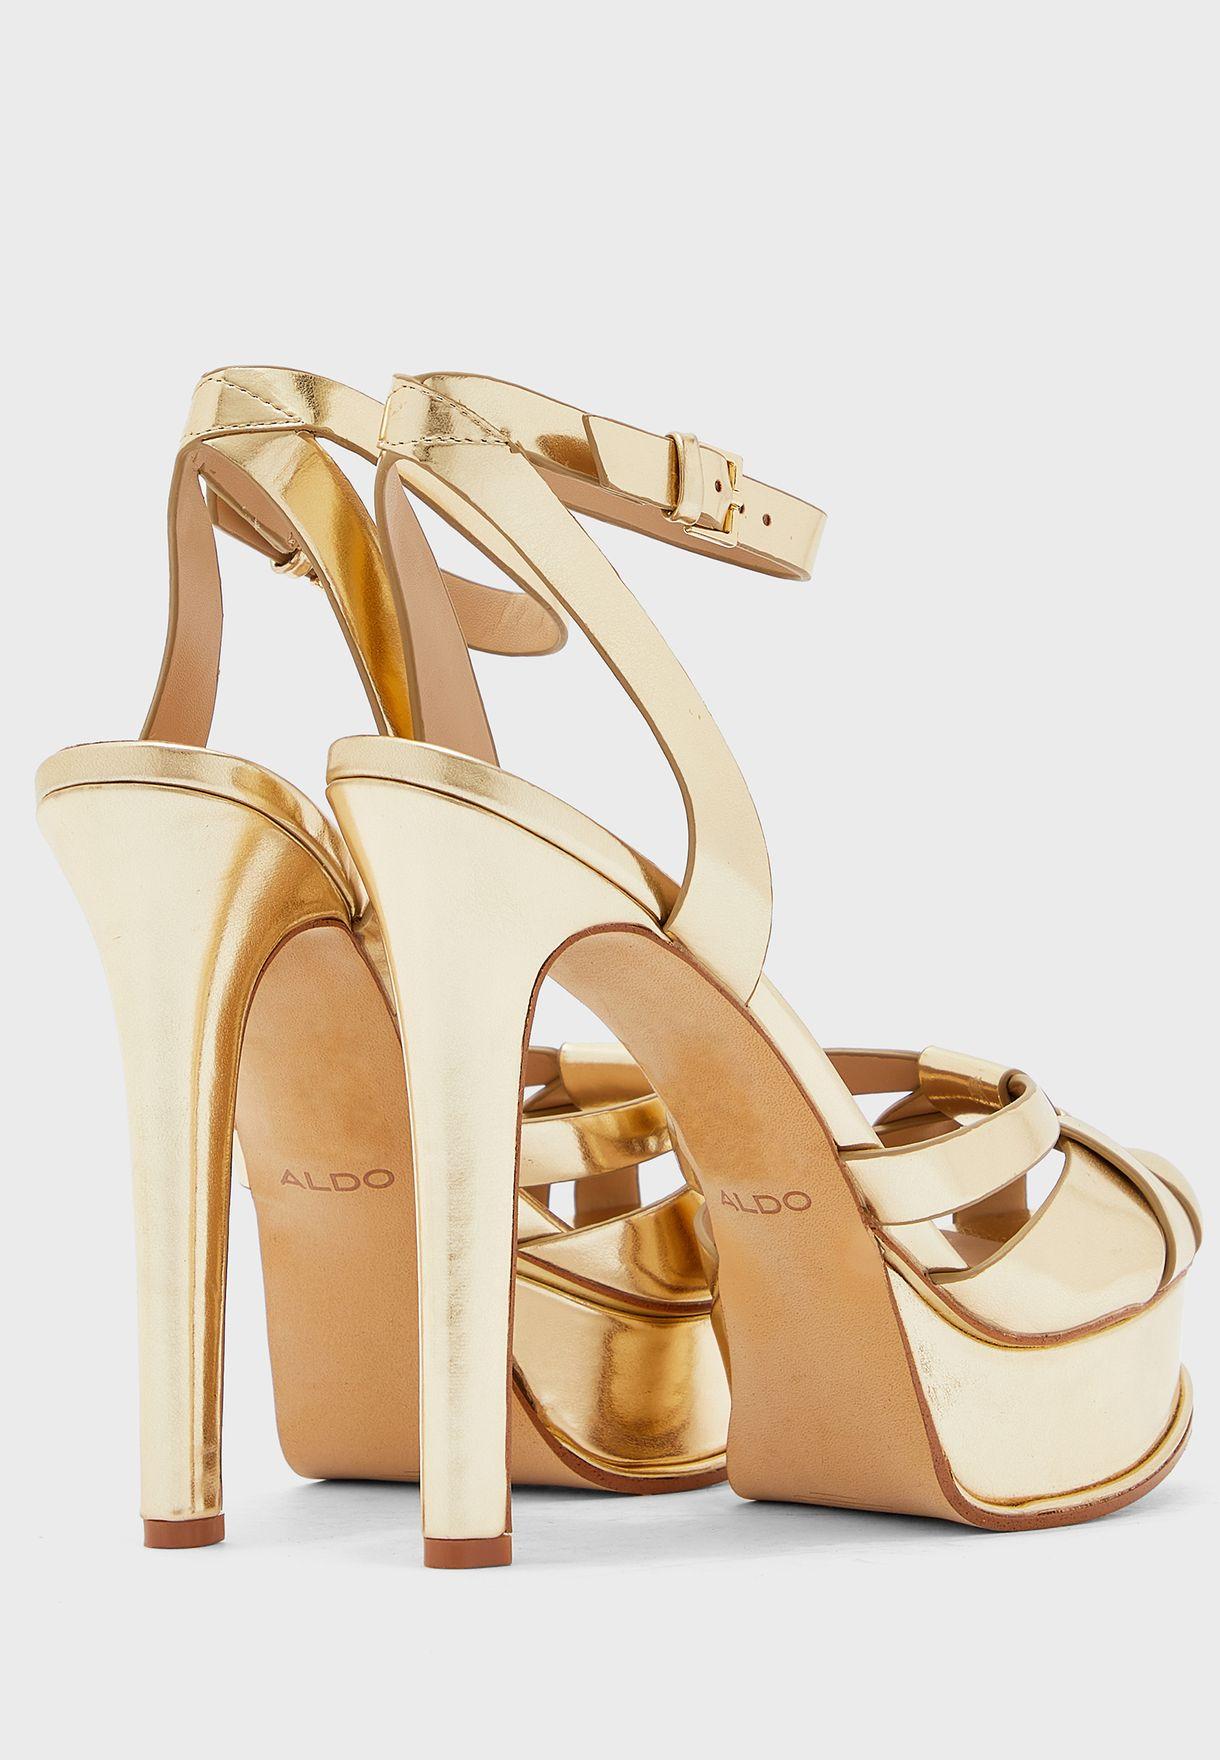 Lacla High Heel Sandal